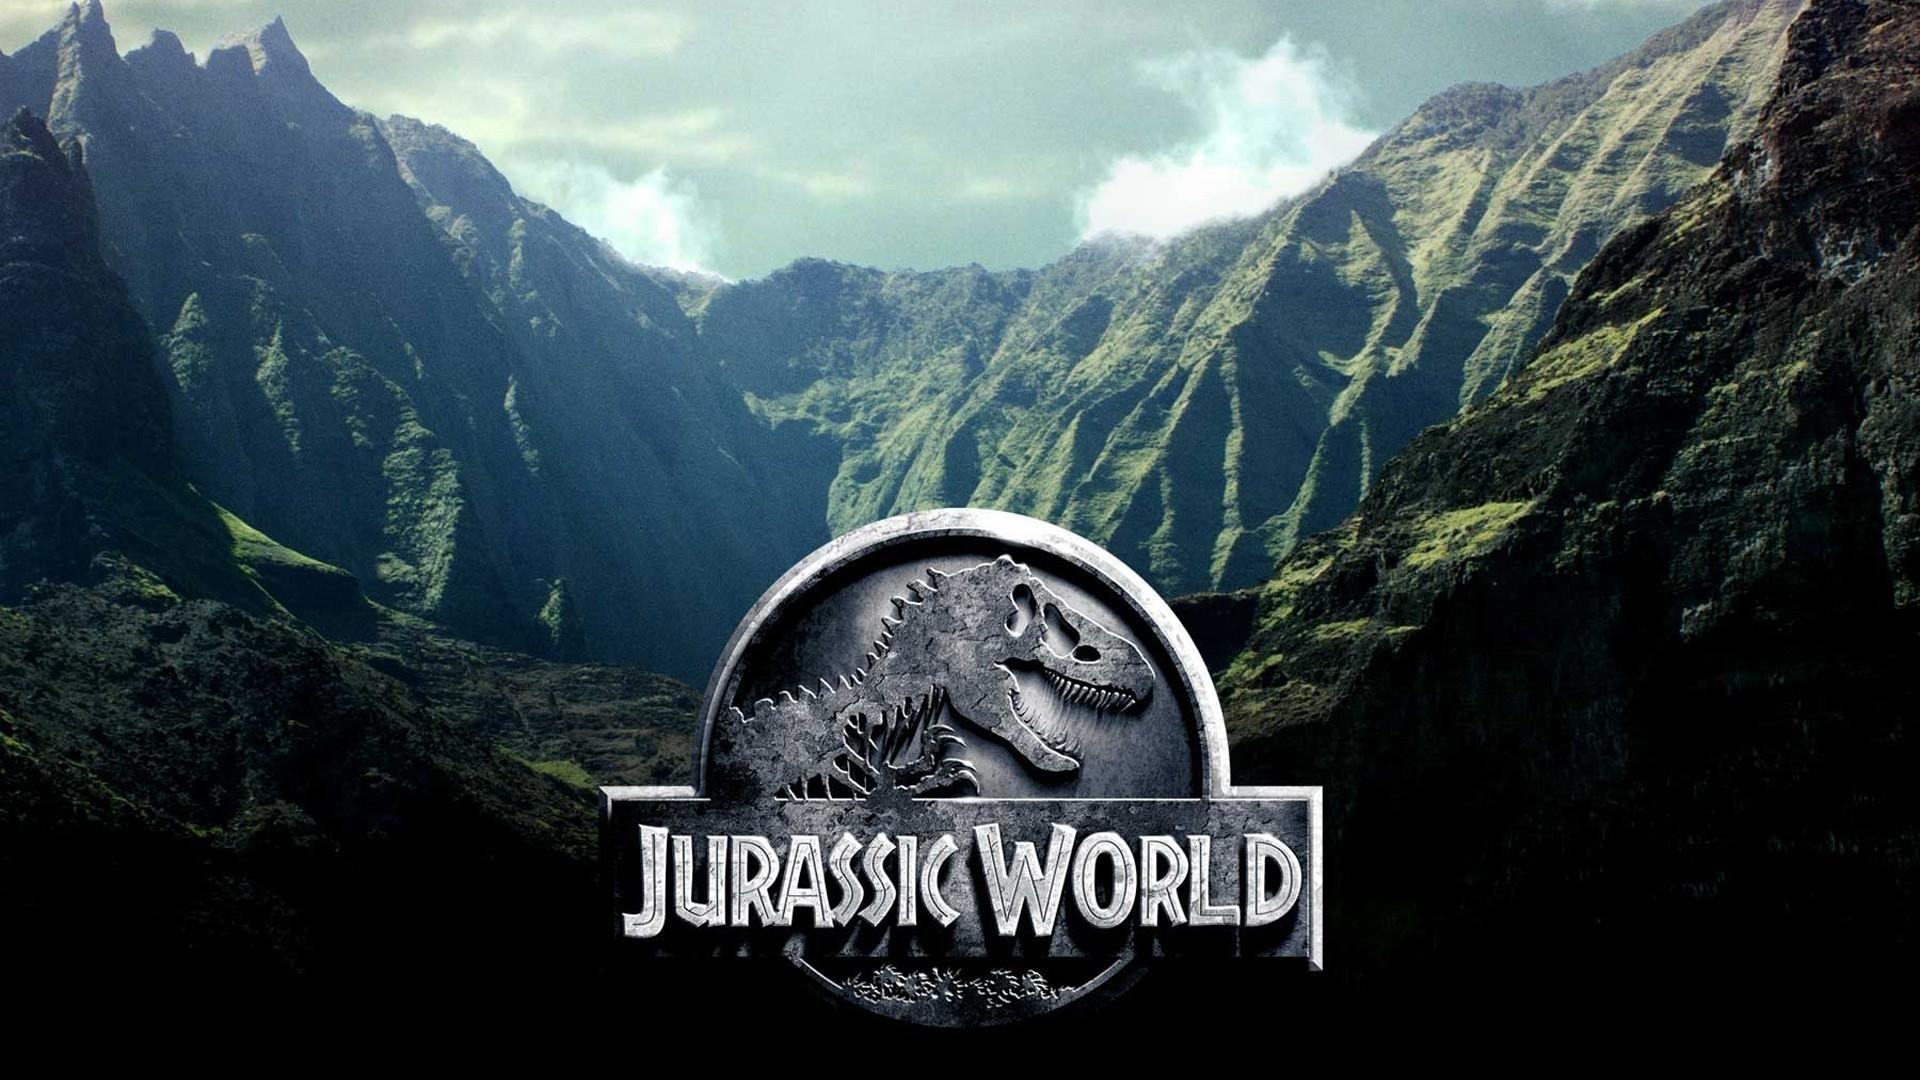 Jurassic World Wallpaper and Background